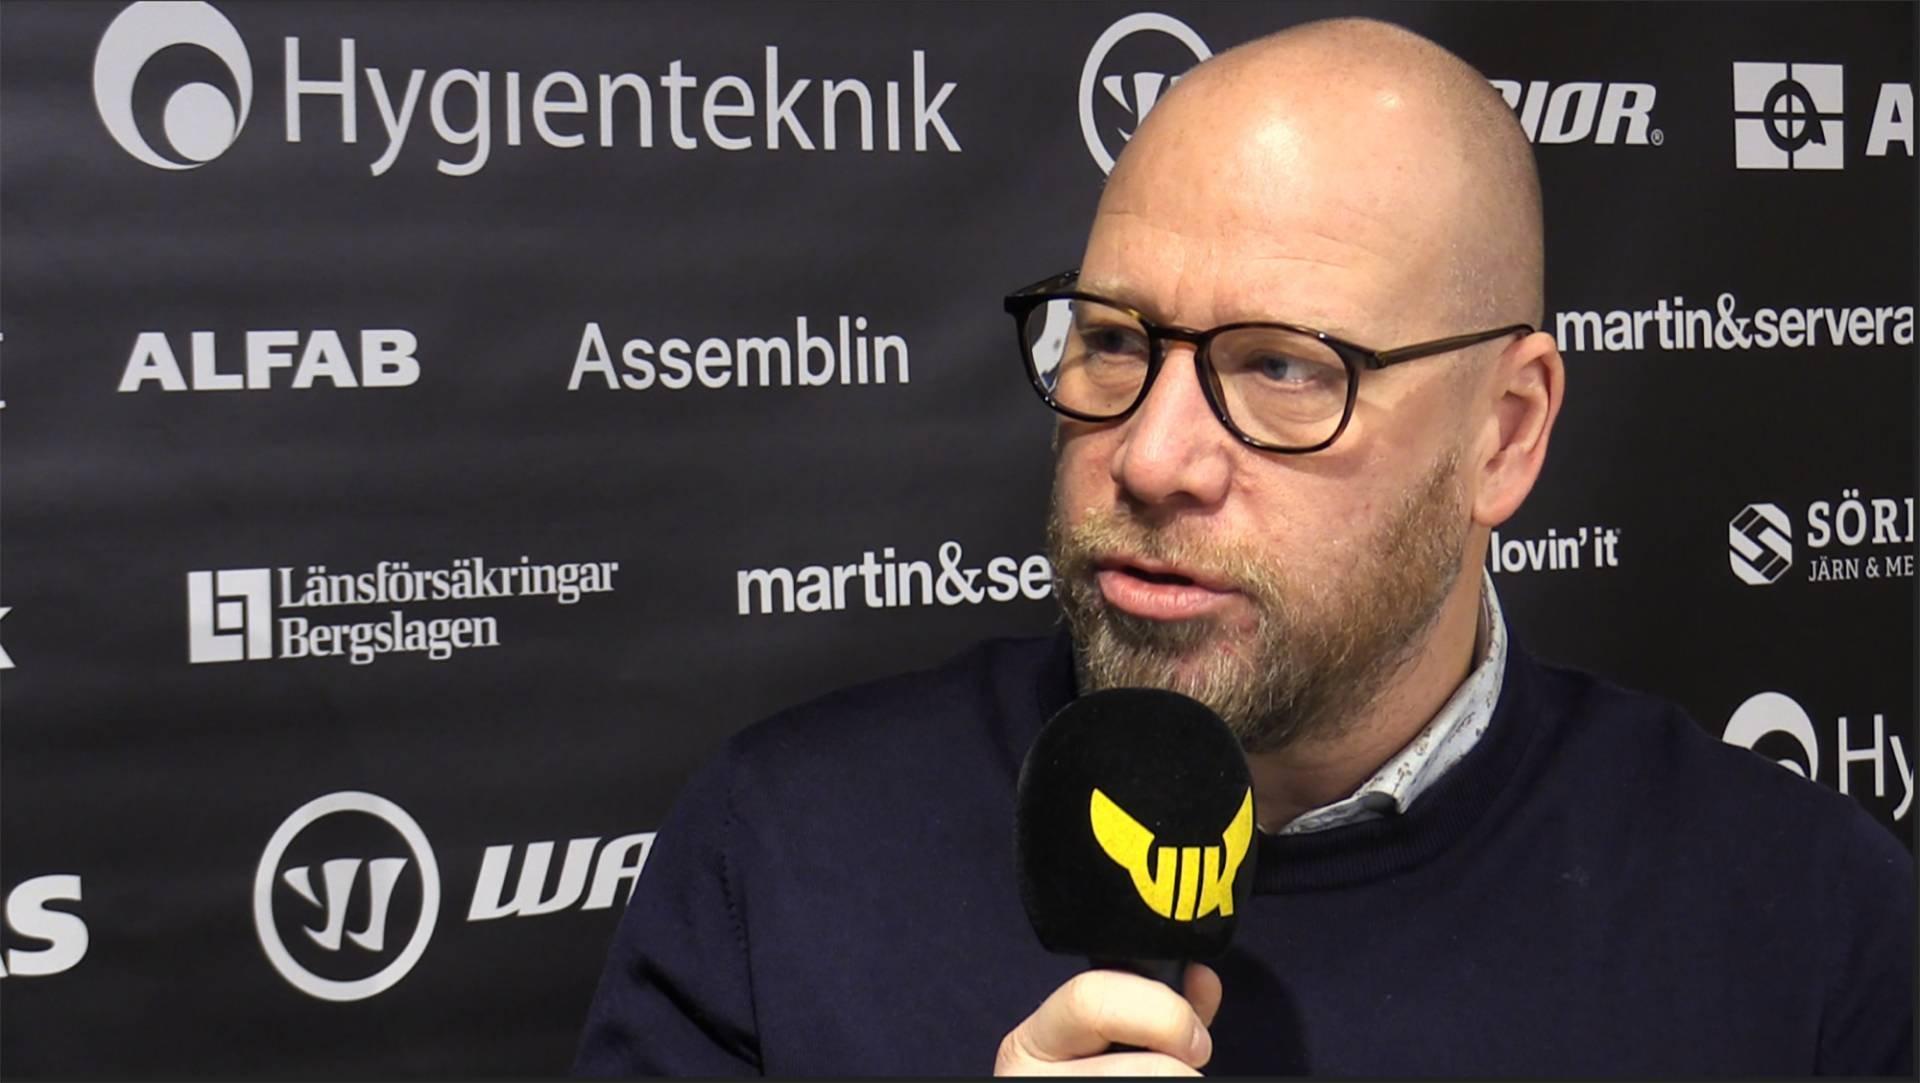 STUDIO VIK med Patrik Zetterberg